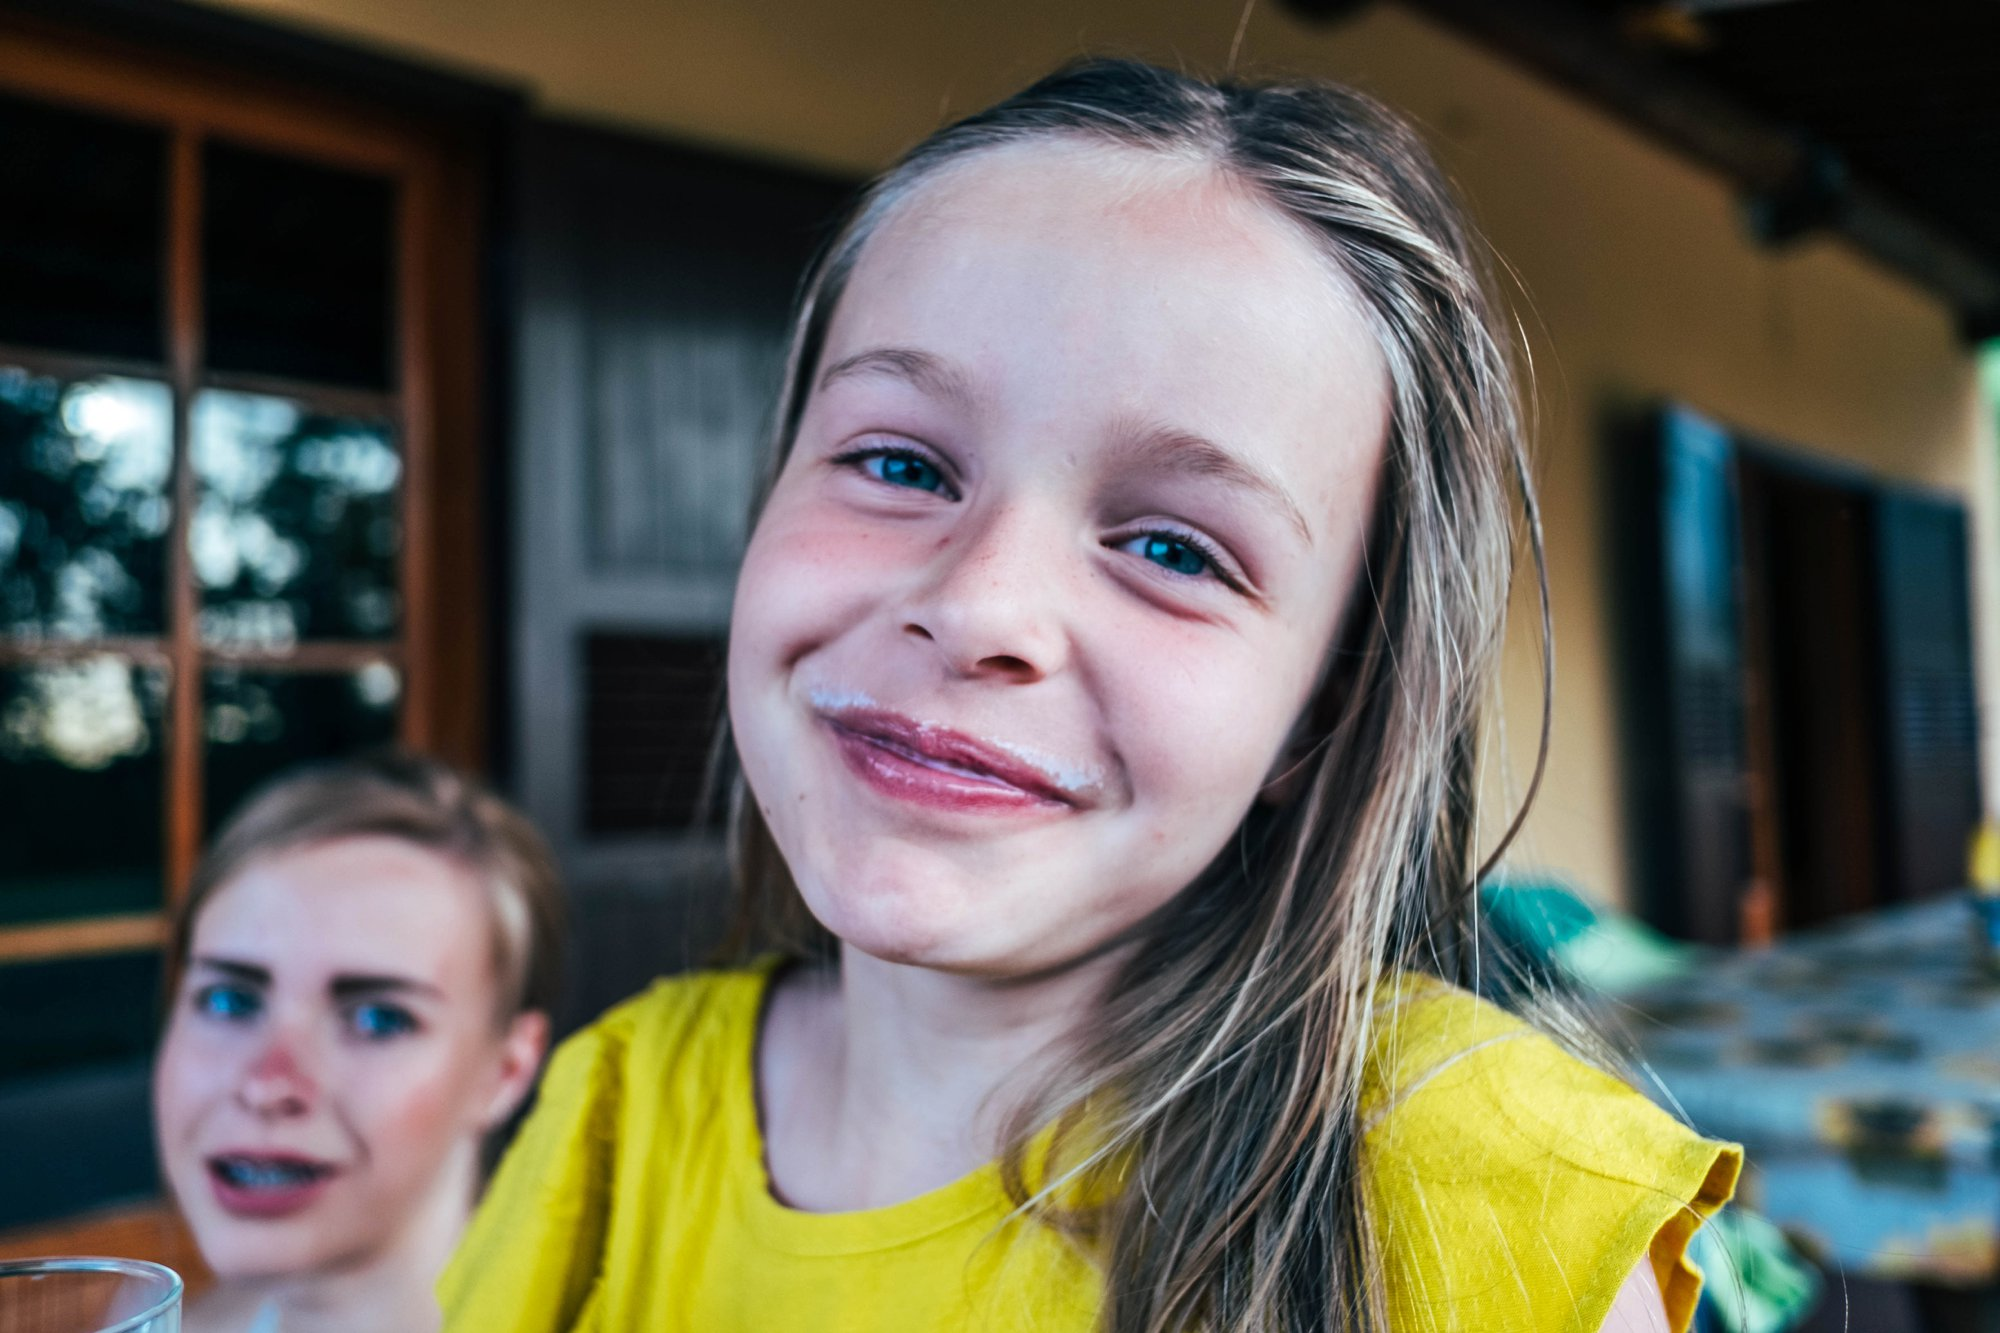 Little girl with milk moustache Essex Documentary Wedding Travel Family Photographer